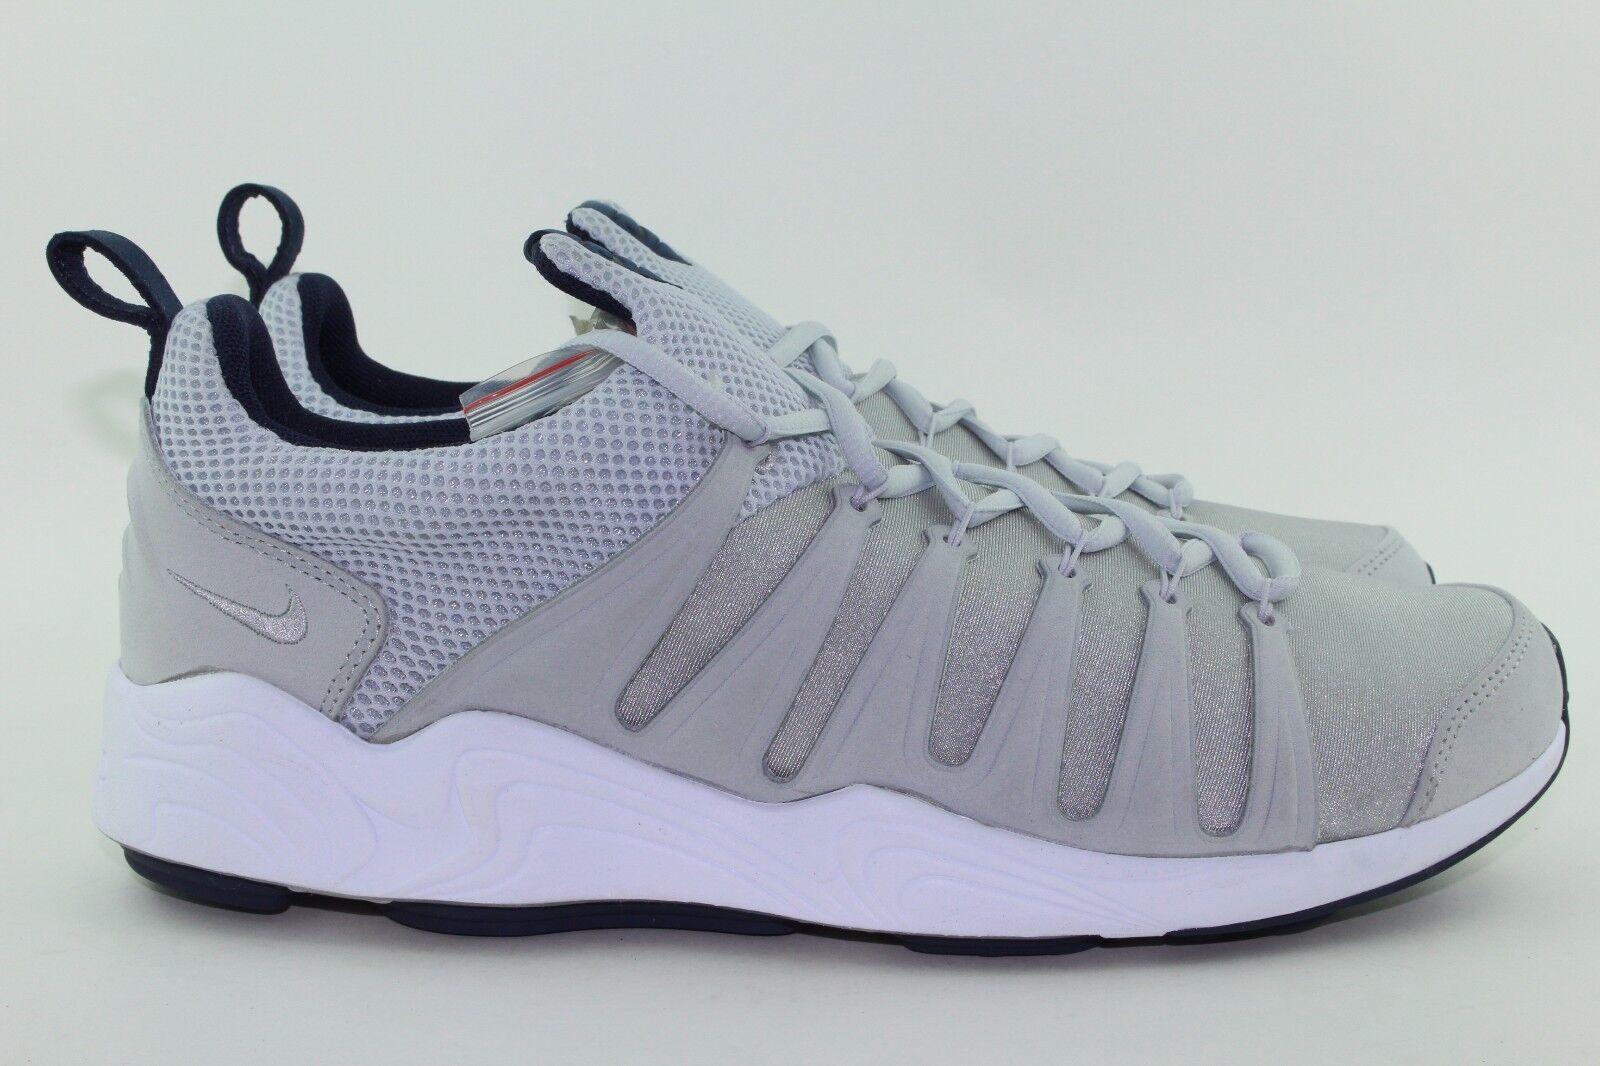 Nike laboratorio air 8,5 zoom spirimic uomini dimensioni 8,5 air platino nuova luce legale metallico raro 7f79bf